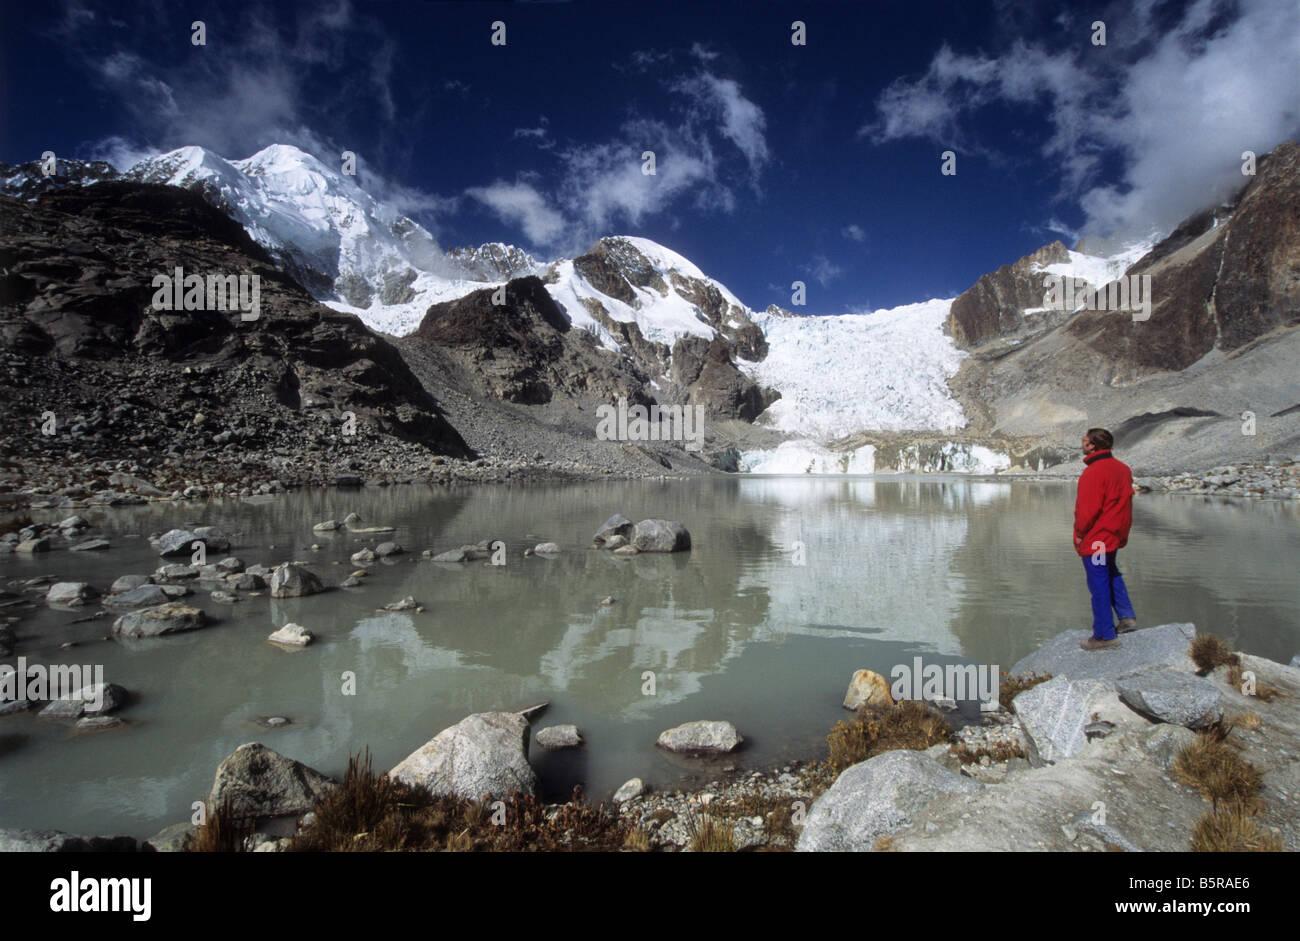 Trekker looking at view at Laguna Glaciar, Mount Illampu in background, Cordillera Real, Bolivia - Stock Image